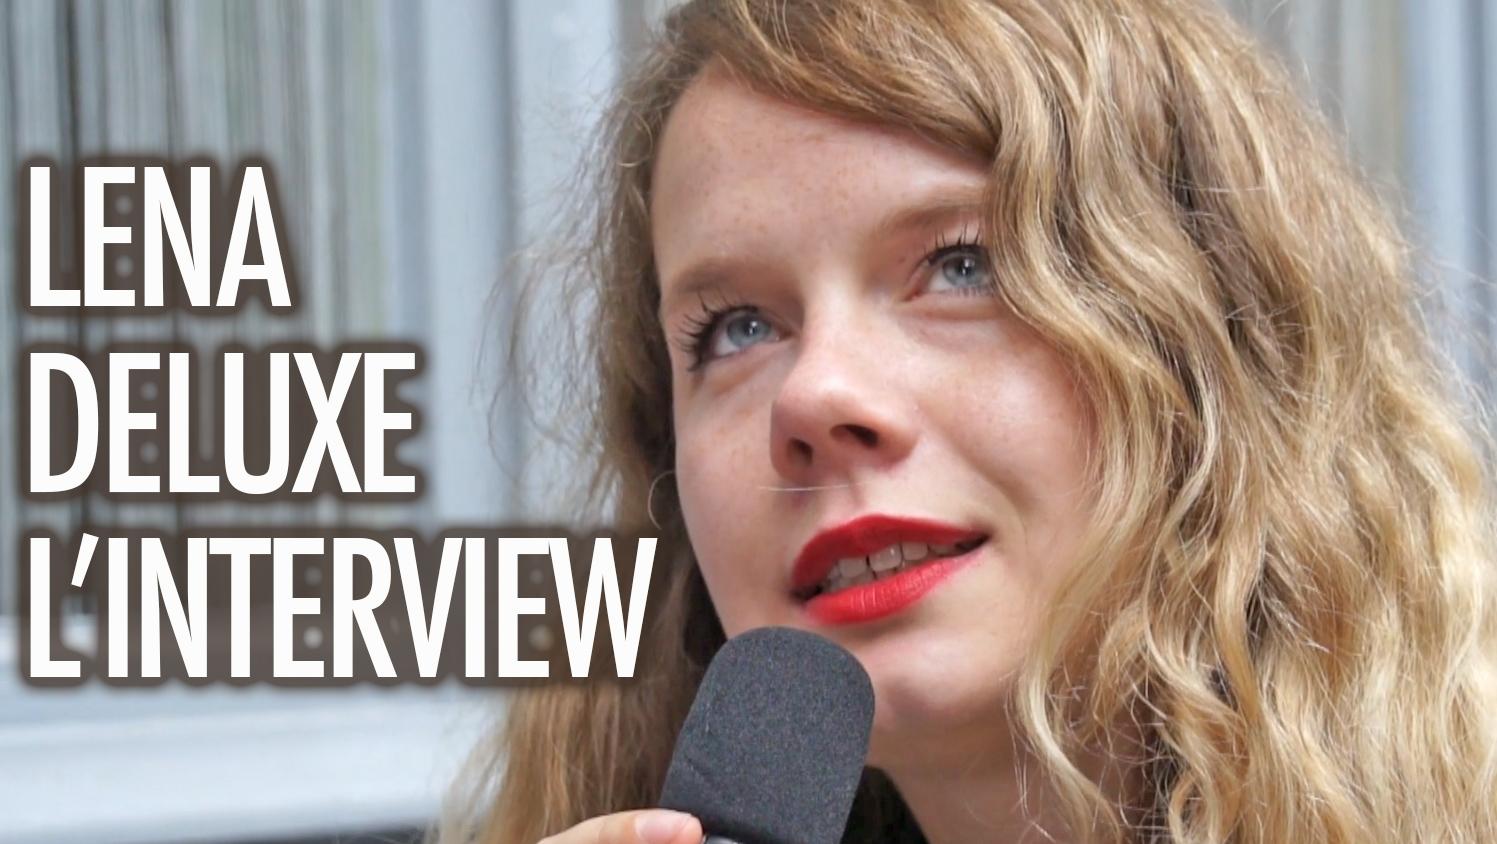 Lena Deluxe l'interview